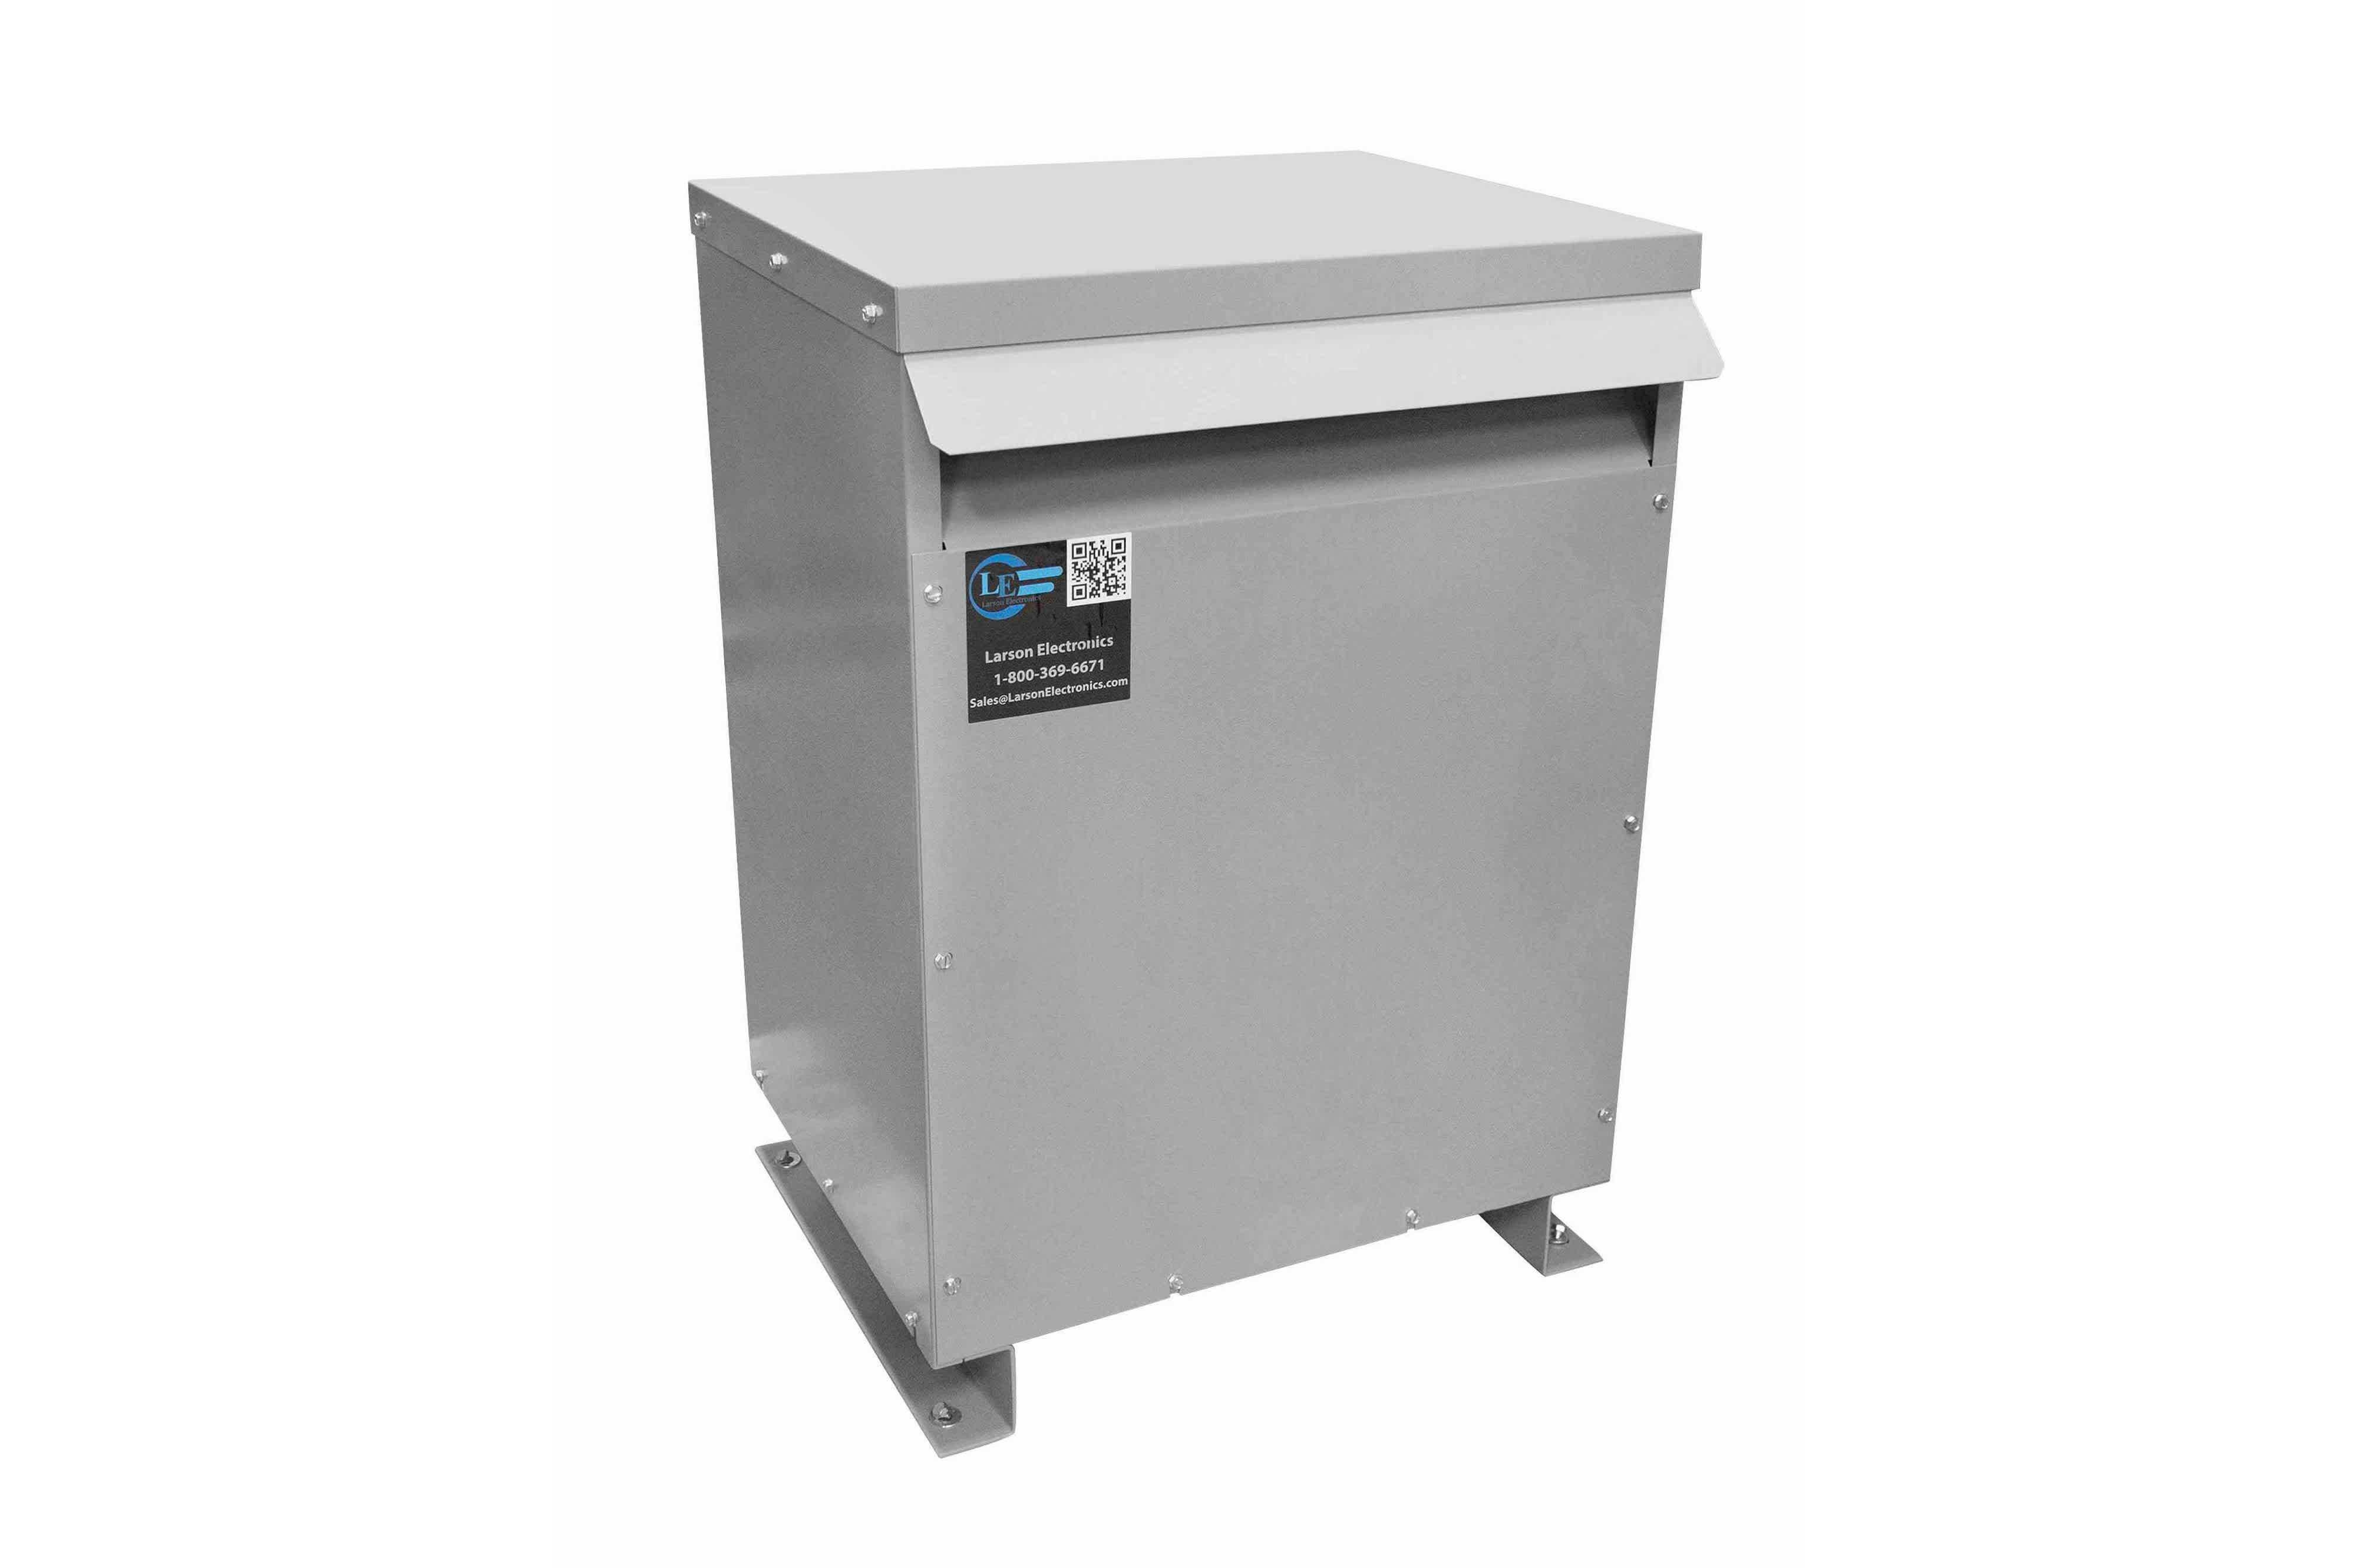 55 kVA 3PH Isolation Transformer, 480V Wye Primary, 415Y/240 Wye-N Secondary, N3R, Ventilated, 60 Hz